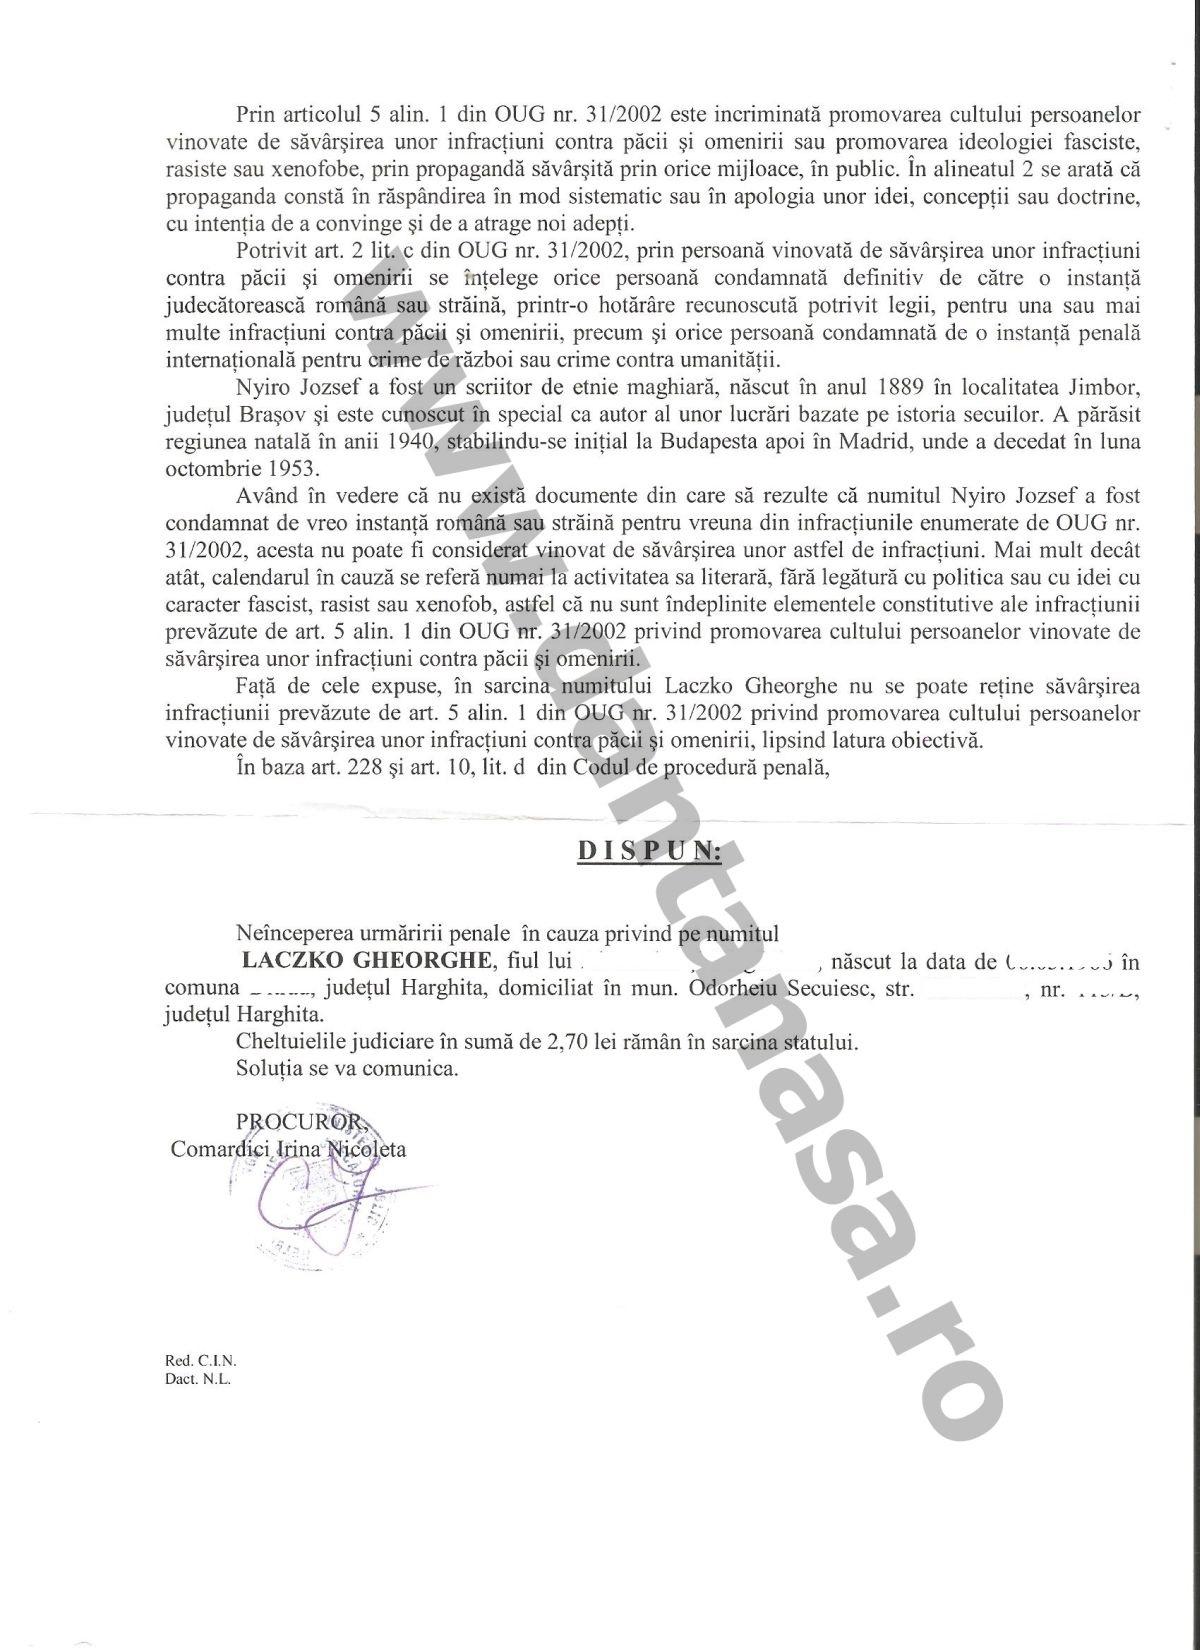 Rezolutie Parchet Odorheiul Secuiesc calendar Nyiro Jozsef Liceul Tamasi Aron doi